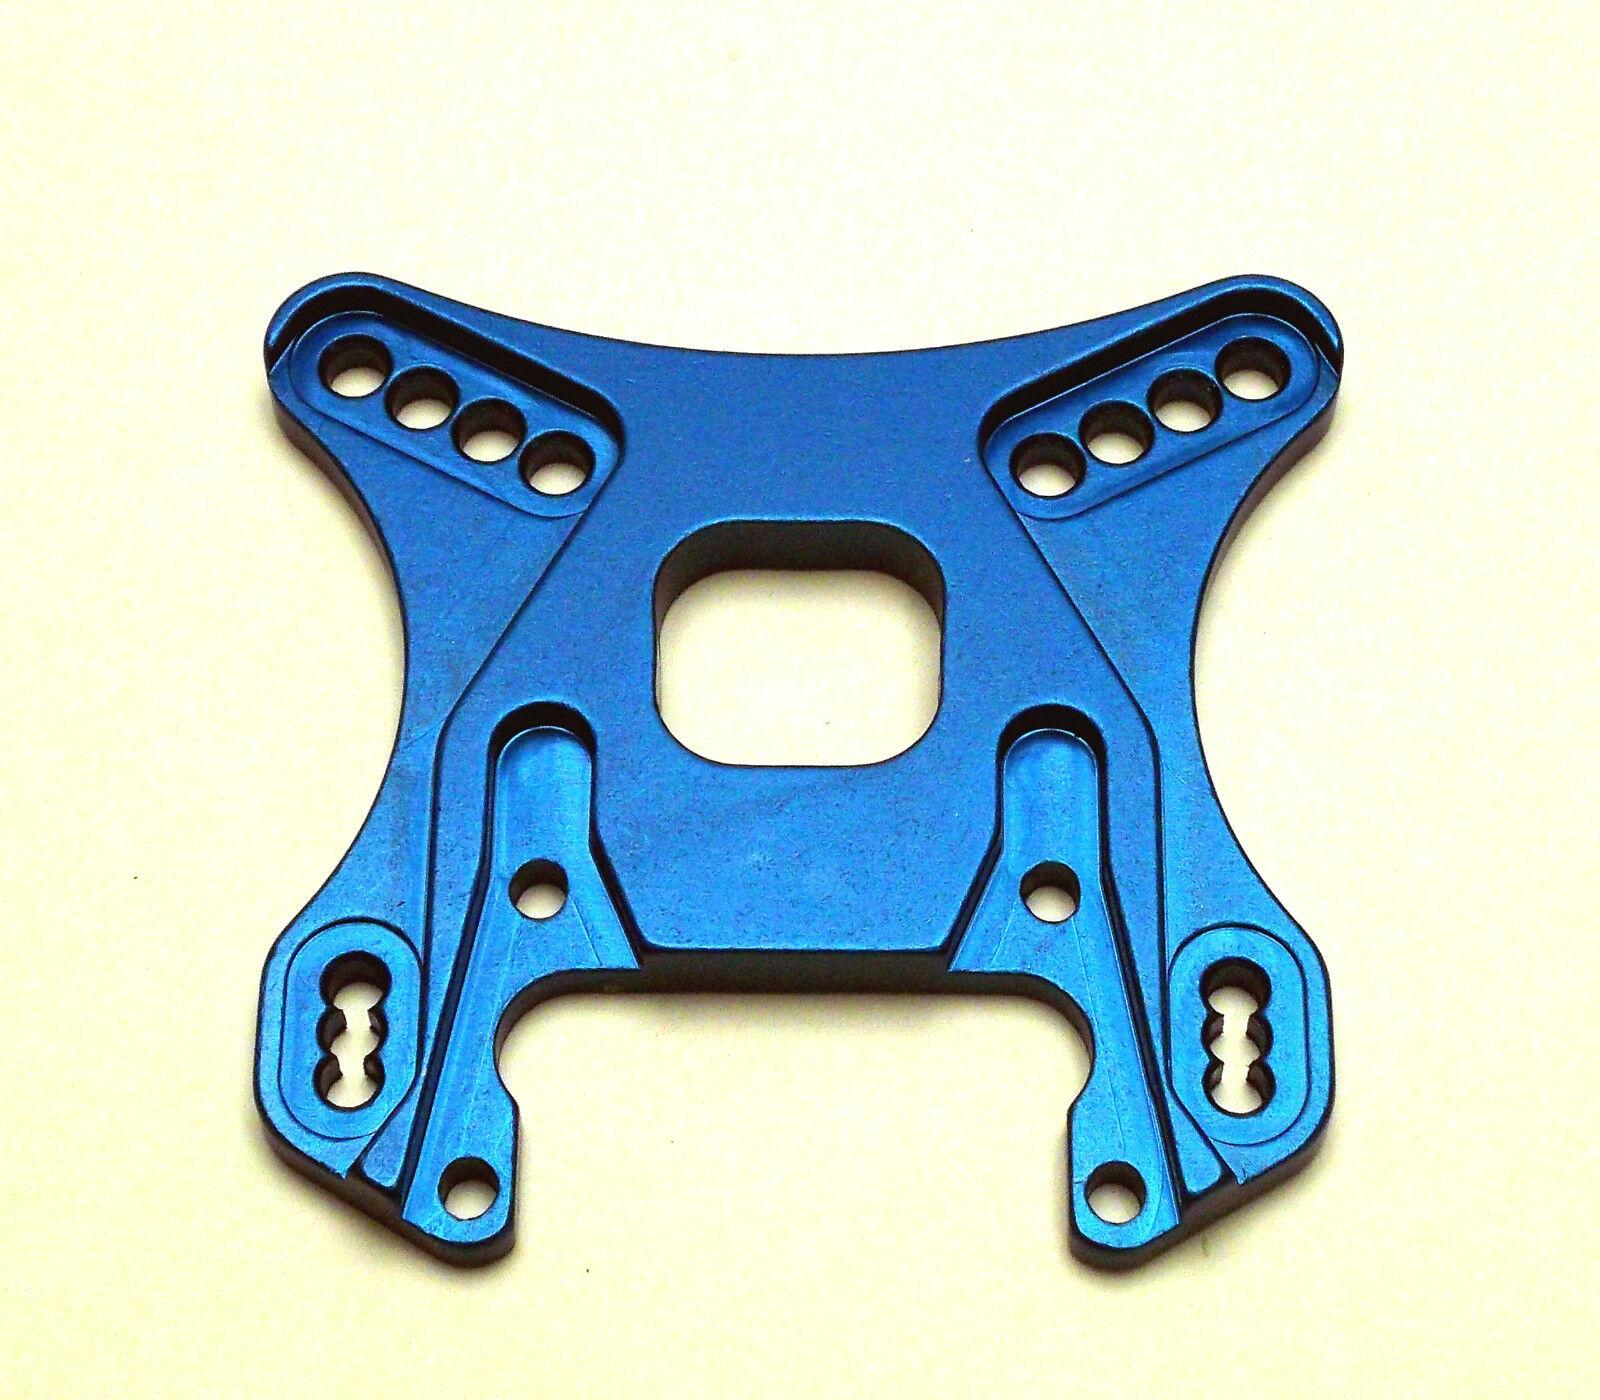 XTREME RACING TEAM LOSI 5IVE Azul Aluminio Frente Torre de choque XTR 1088 oalbl listo para correr